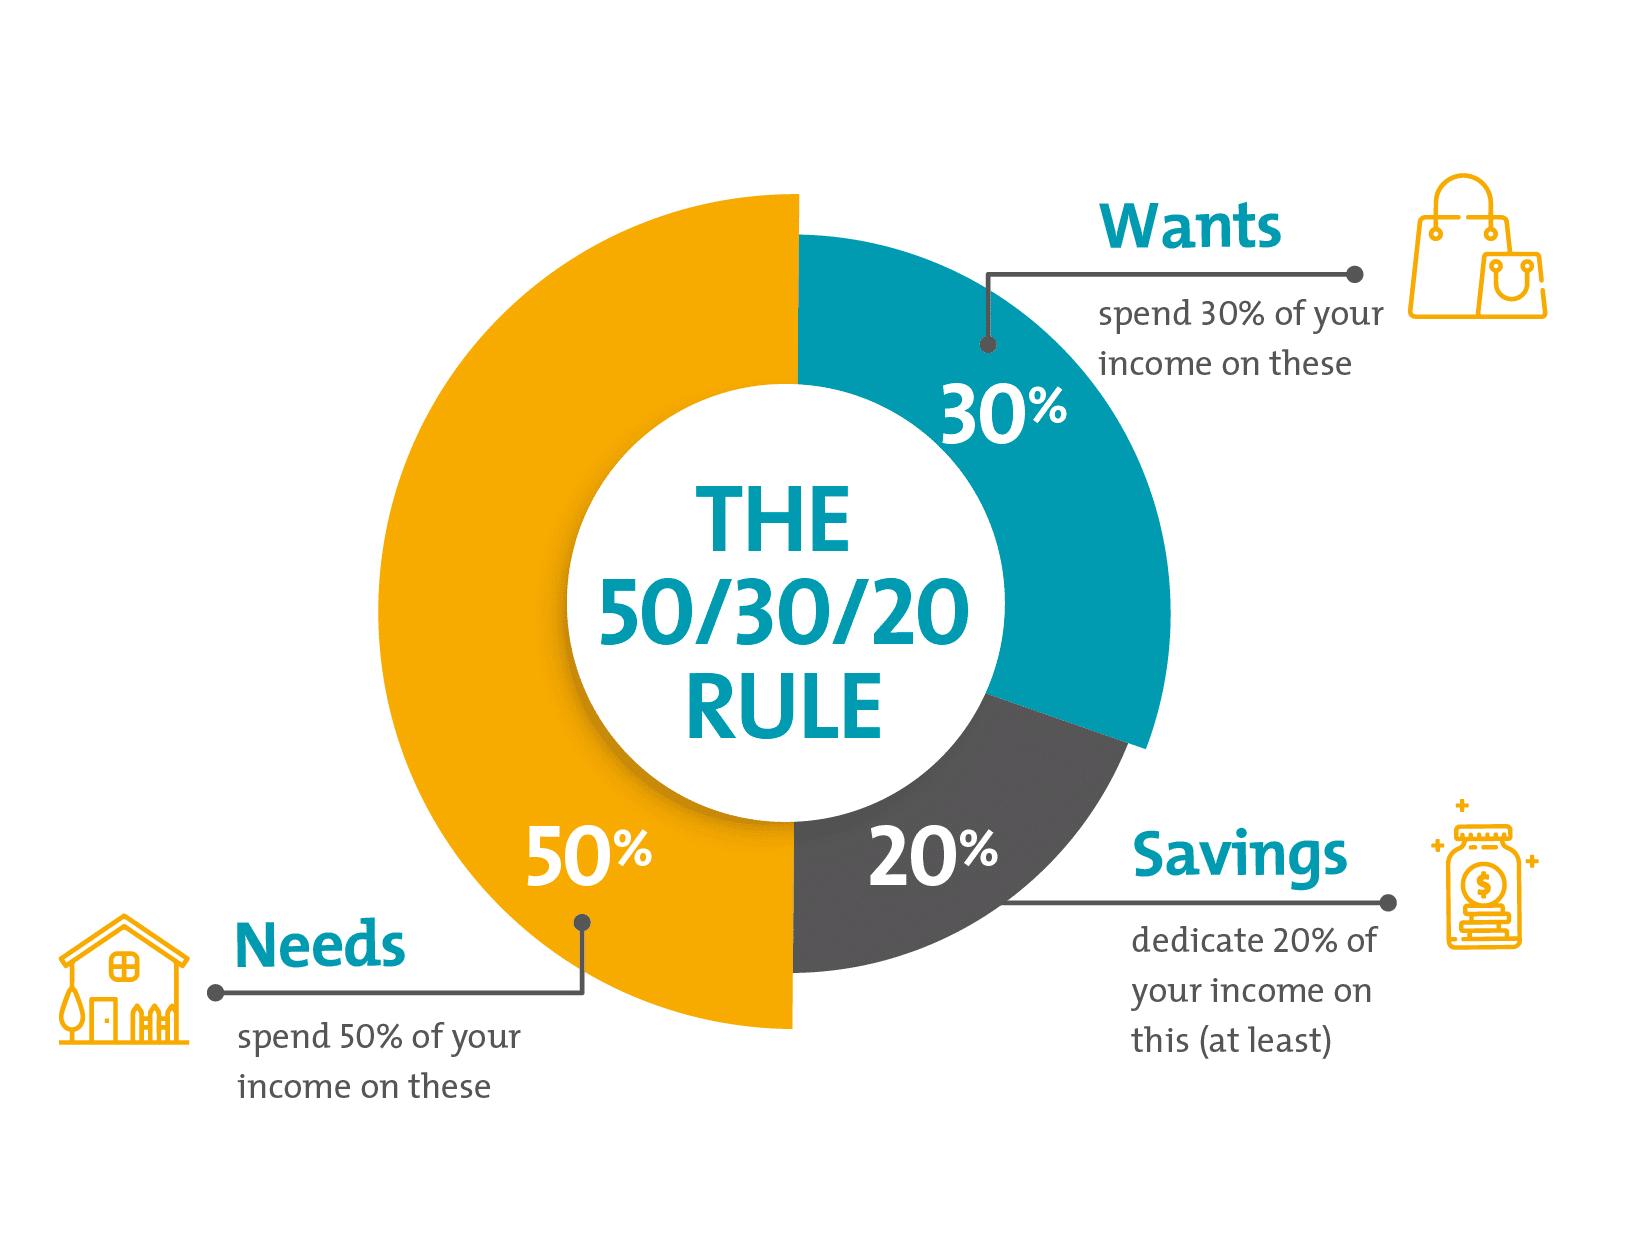 The 50/30/20 rule illustration